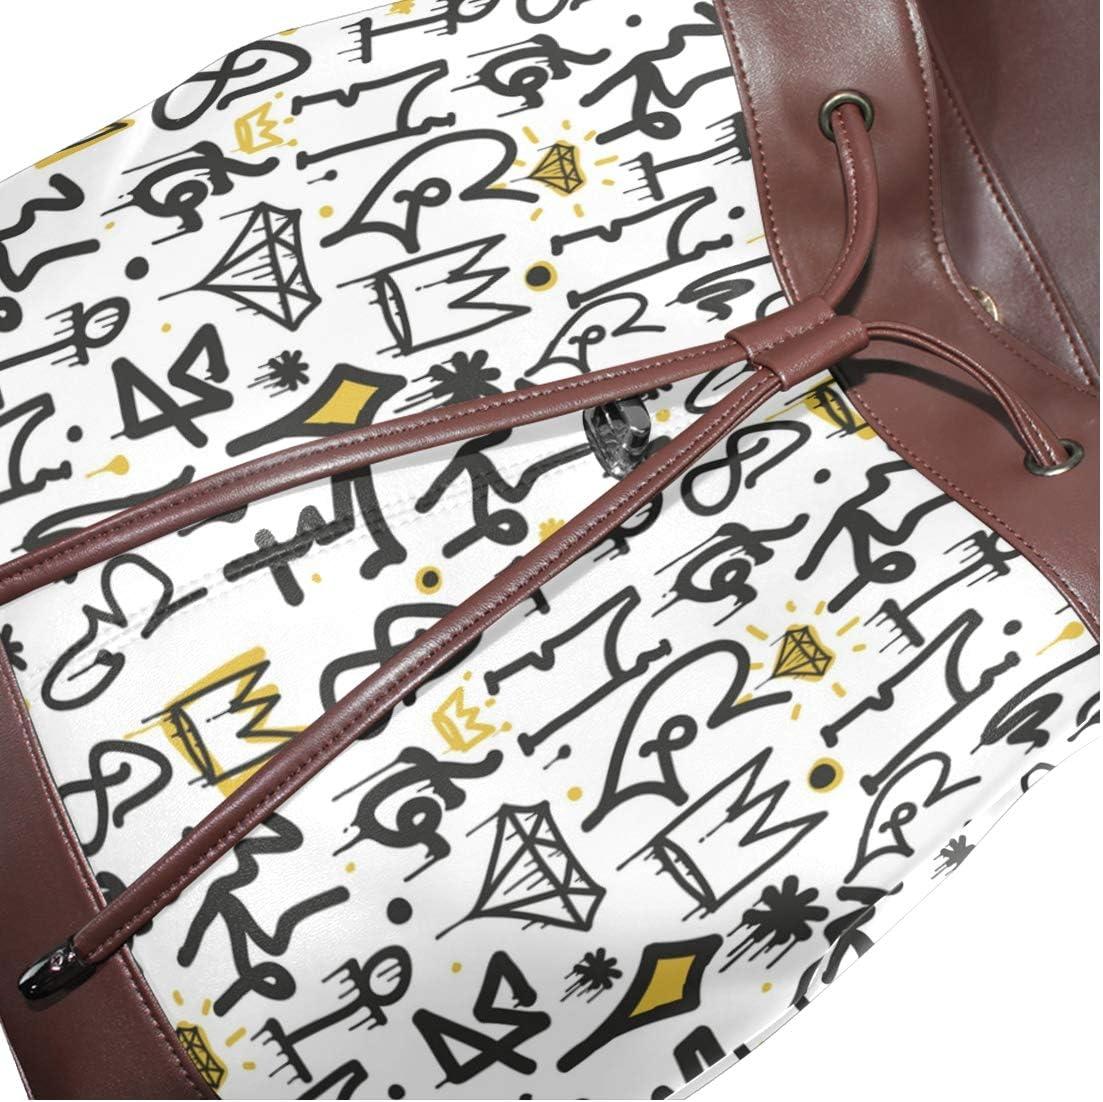 Leather Graffiti Background Pattern Backpack Daypack Bag Women